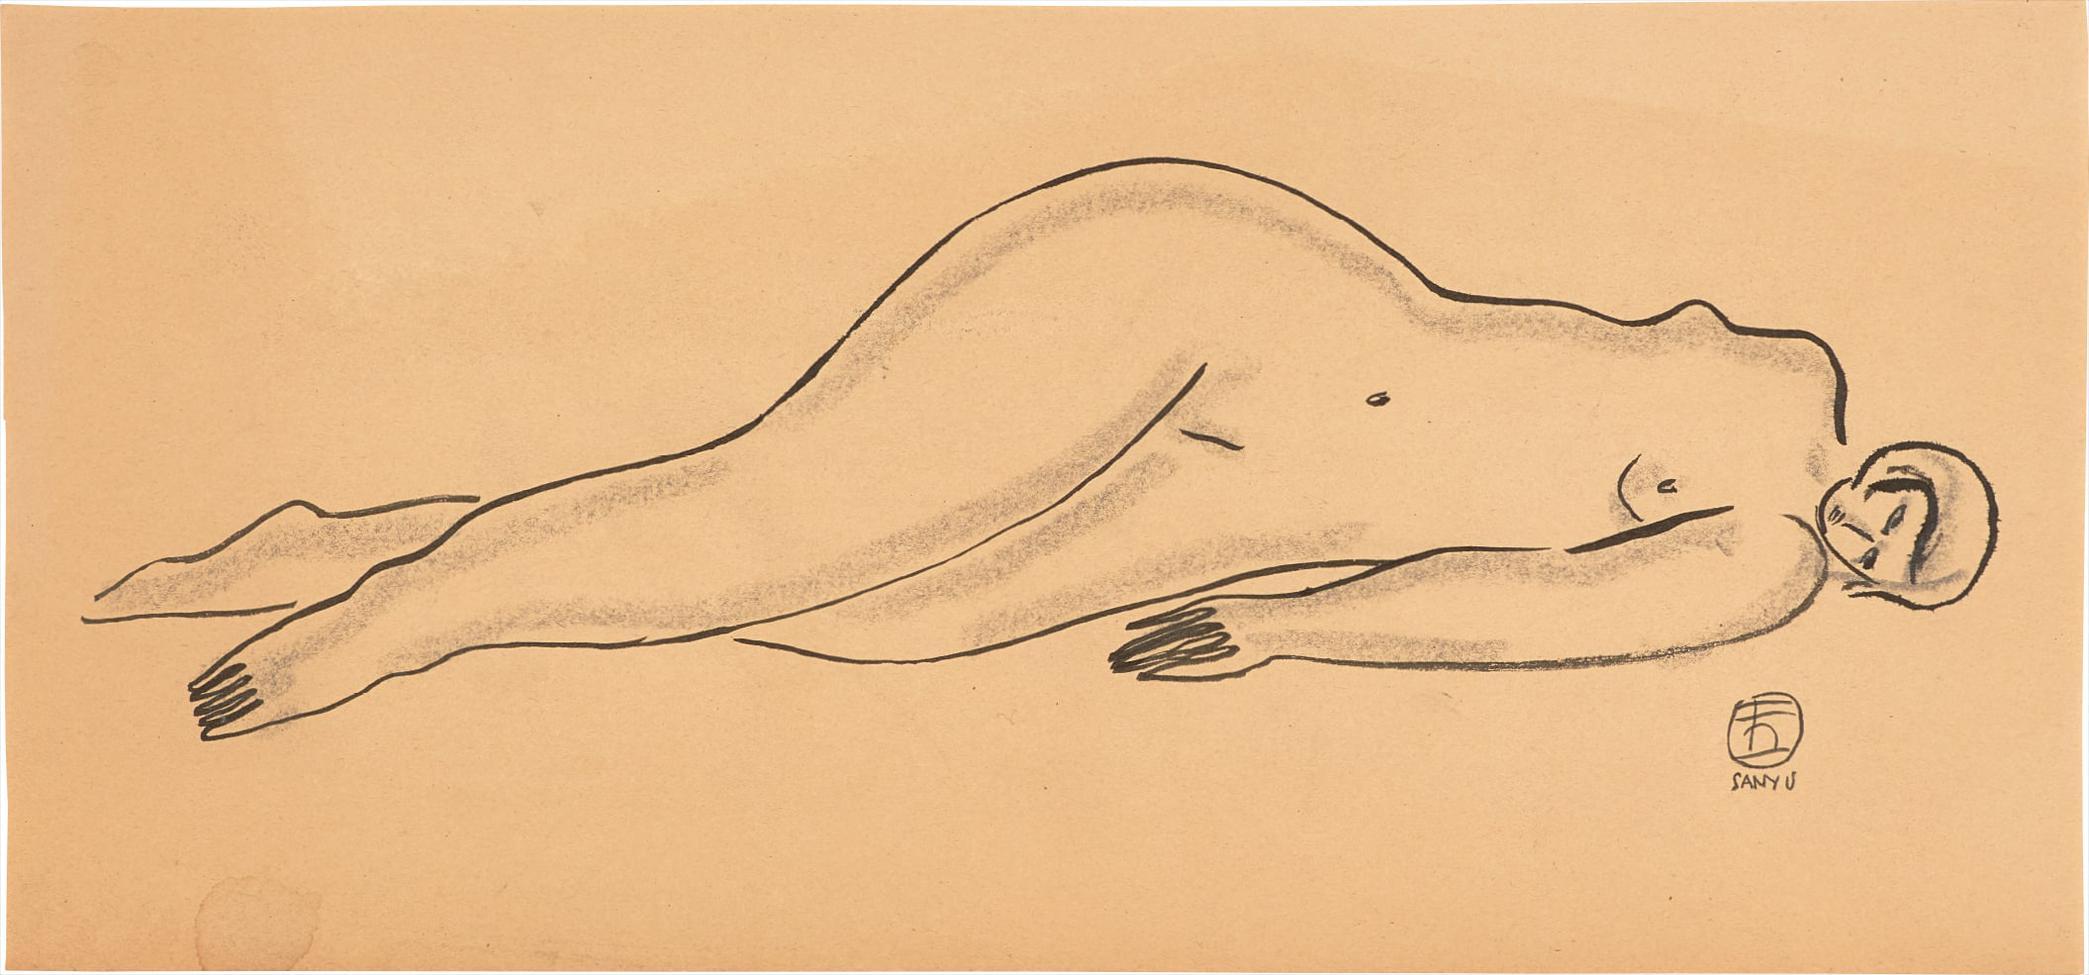 Sanyu-Reclining Nude-